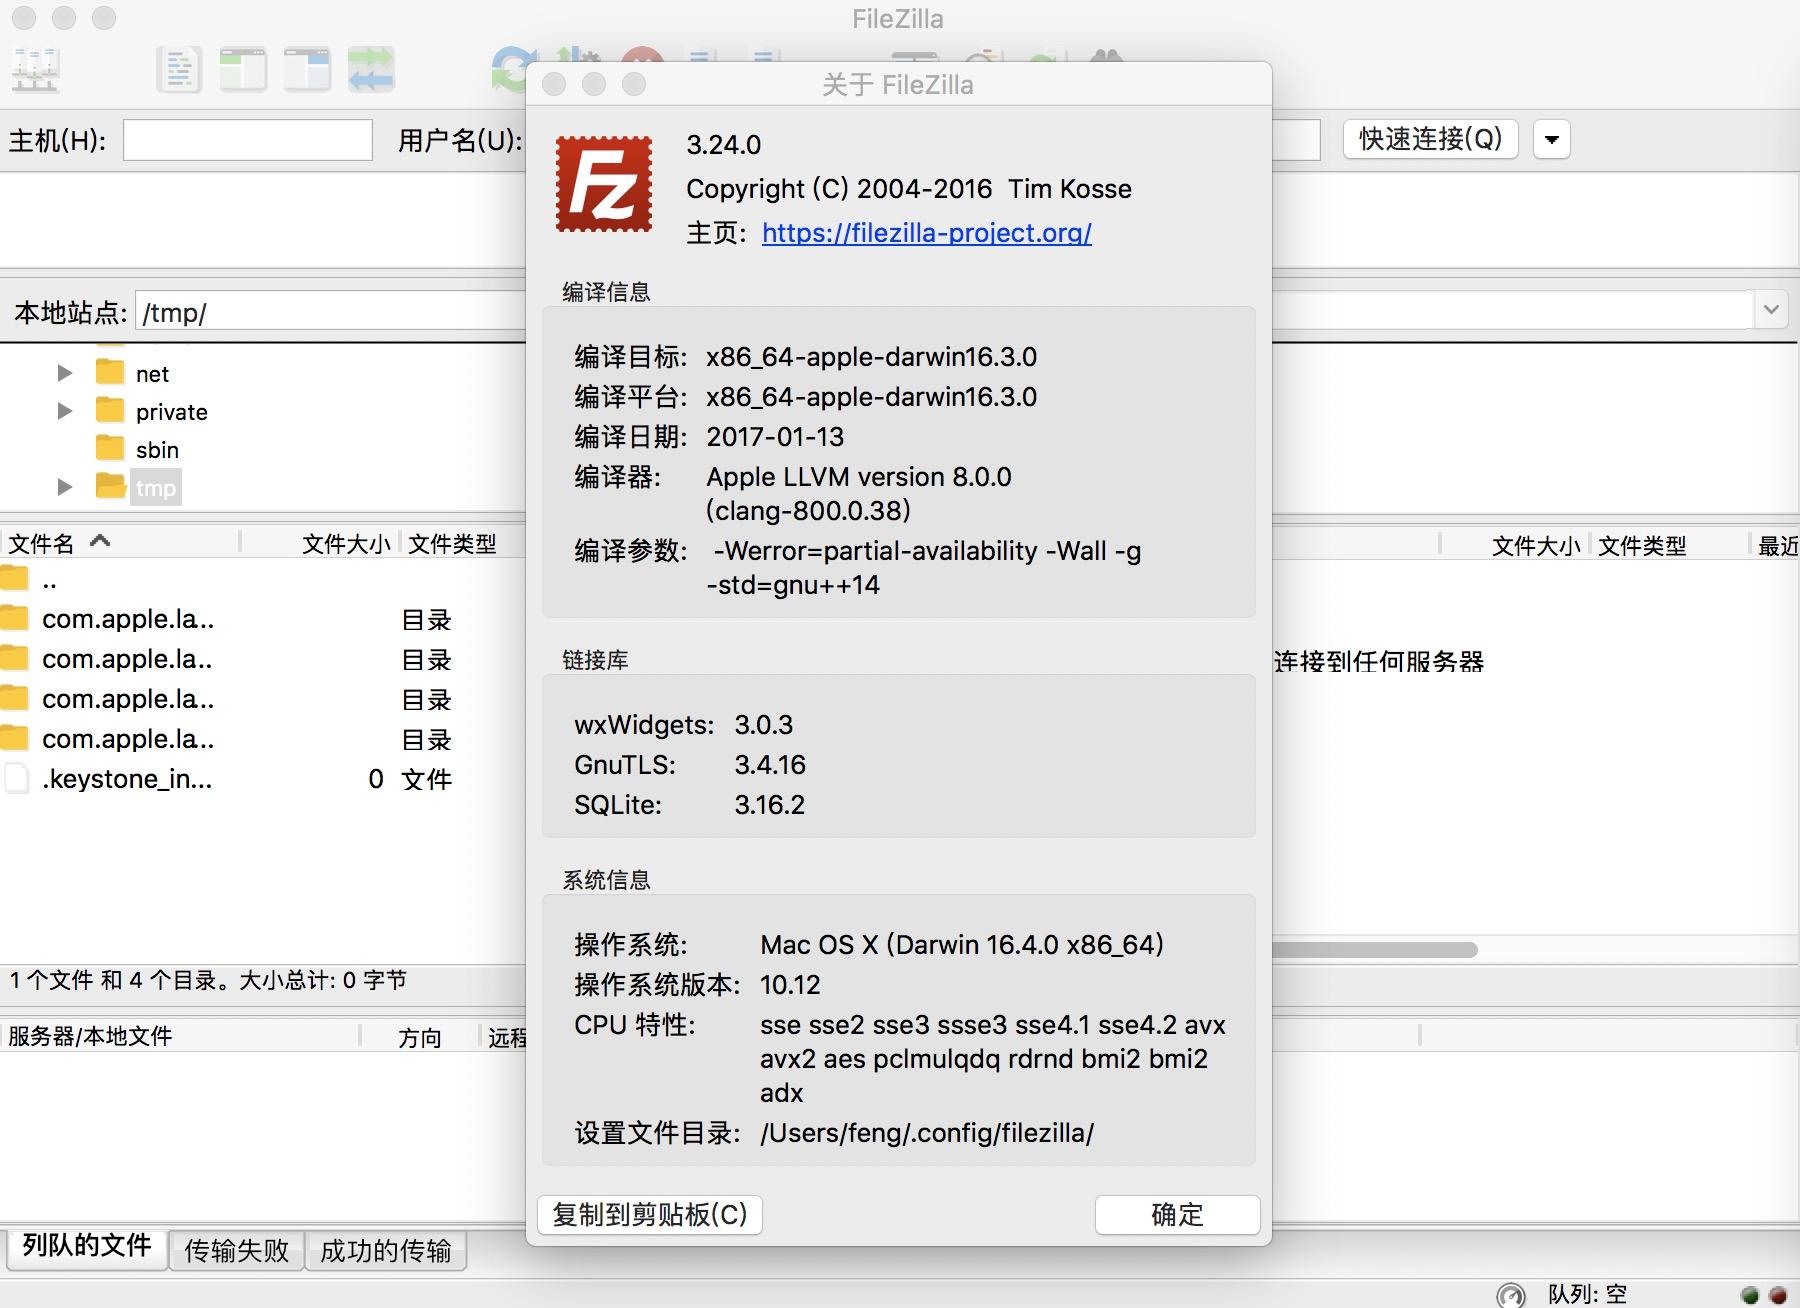 FileZilla - 开源免费的全平台 FTP/SFTP 客户端